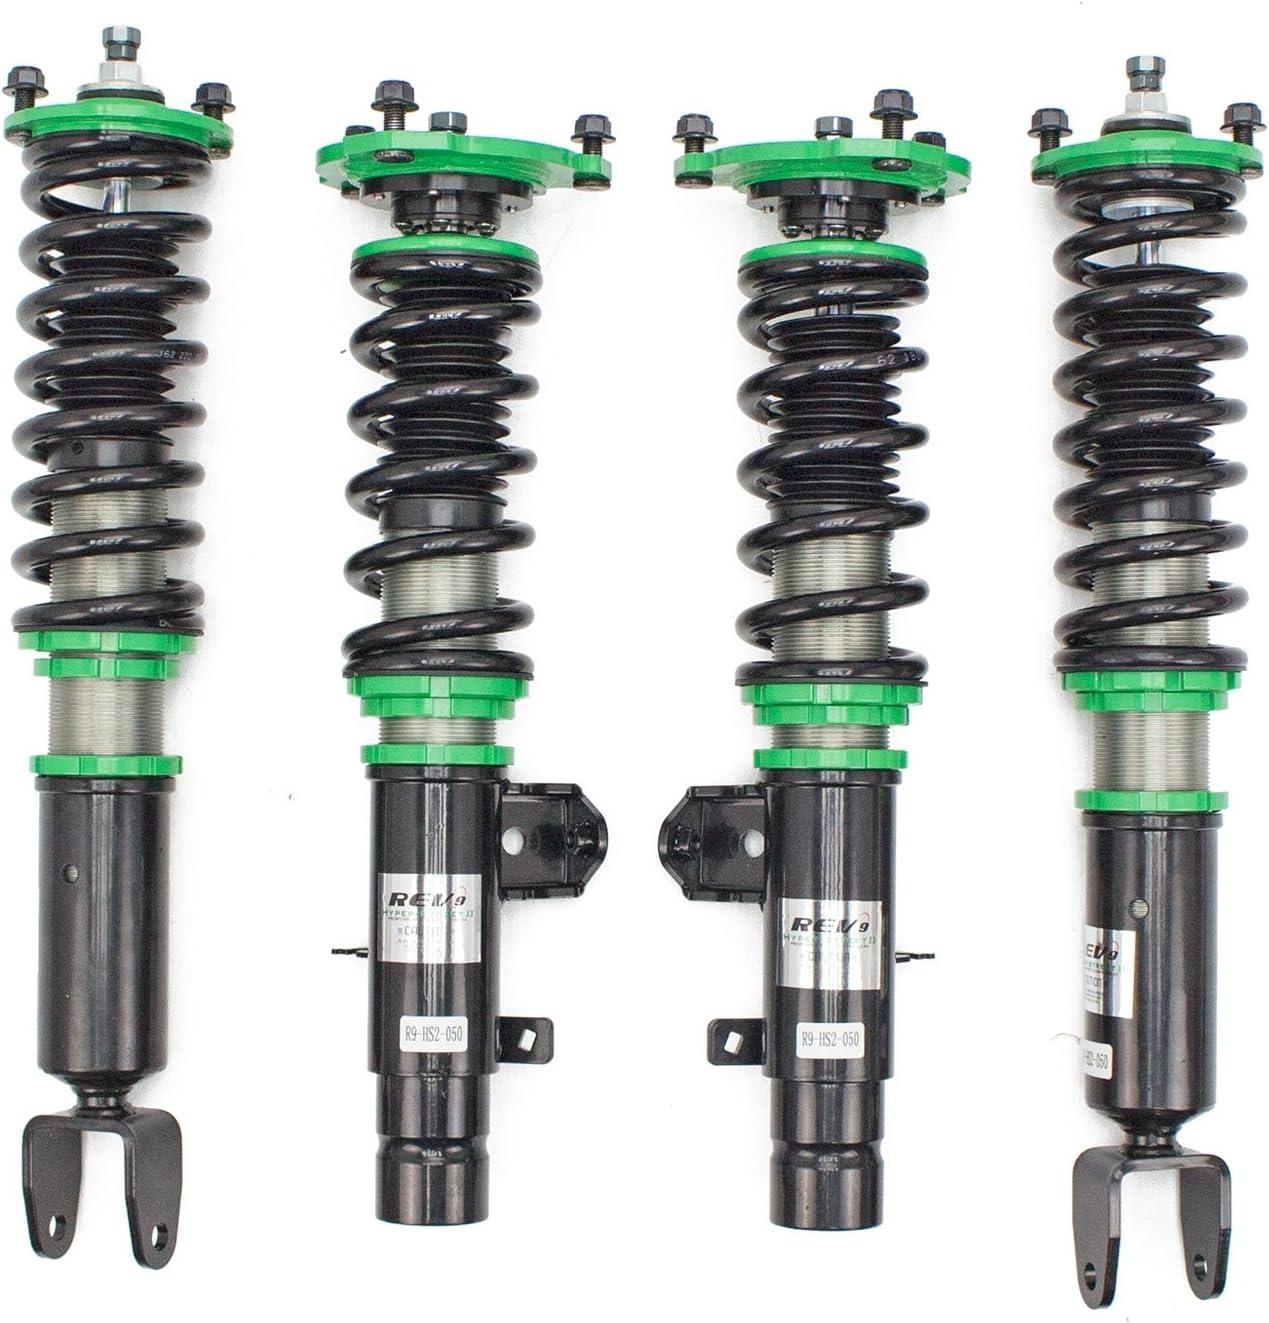 Mono-Tube Shock w// 32 Click Rebound Setting Full Length Adjustable Hyper-Street II Coilover Suspension Lowering Kit